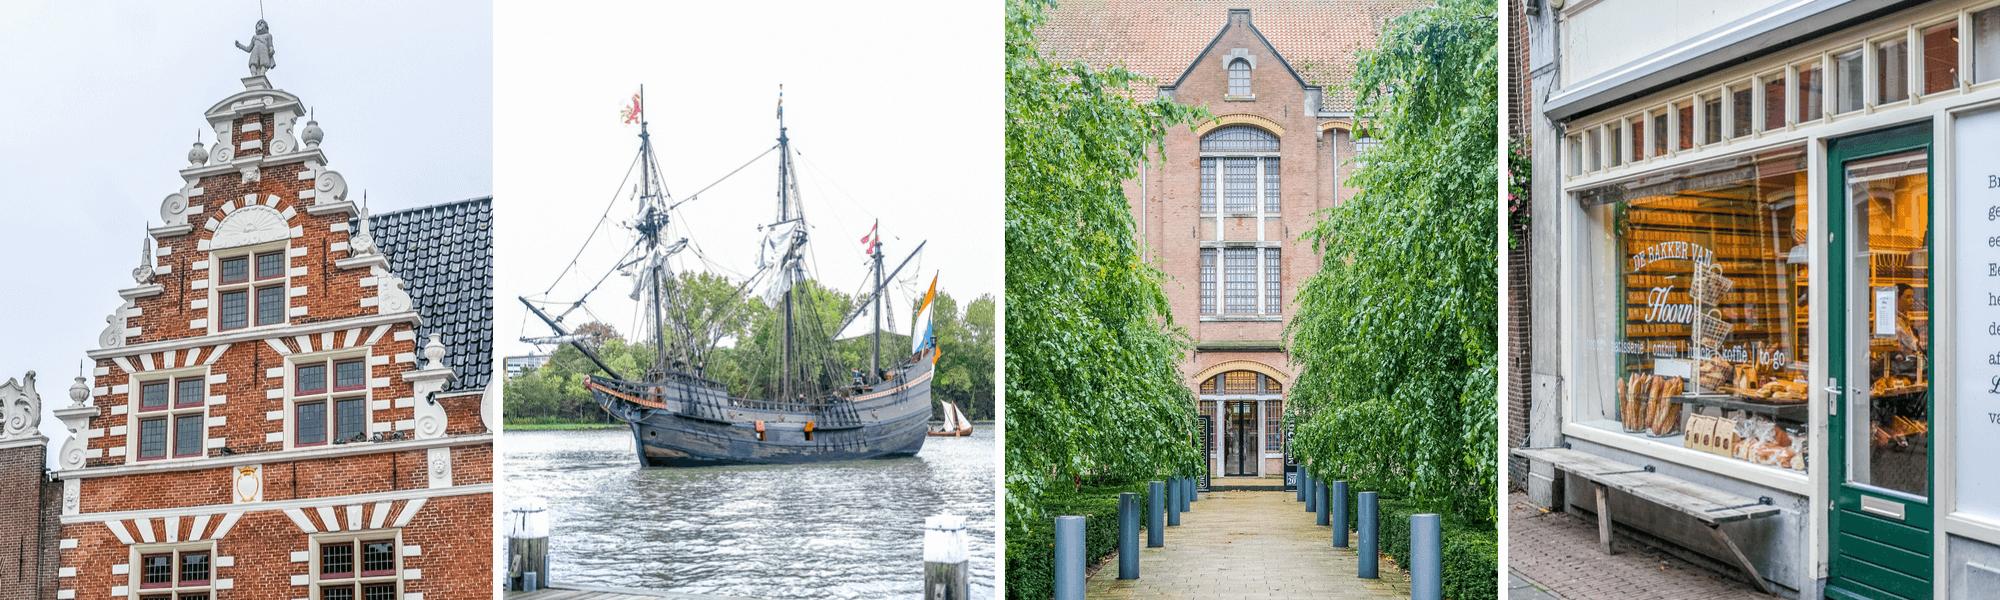 Wat te doen in Hoorn? Nederland